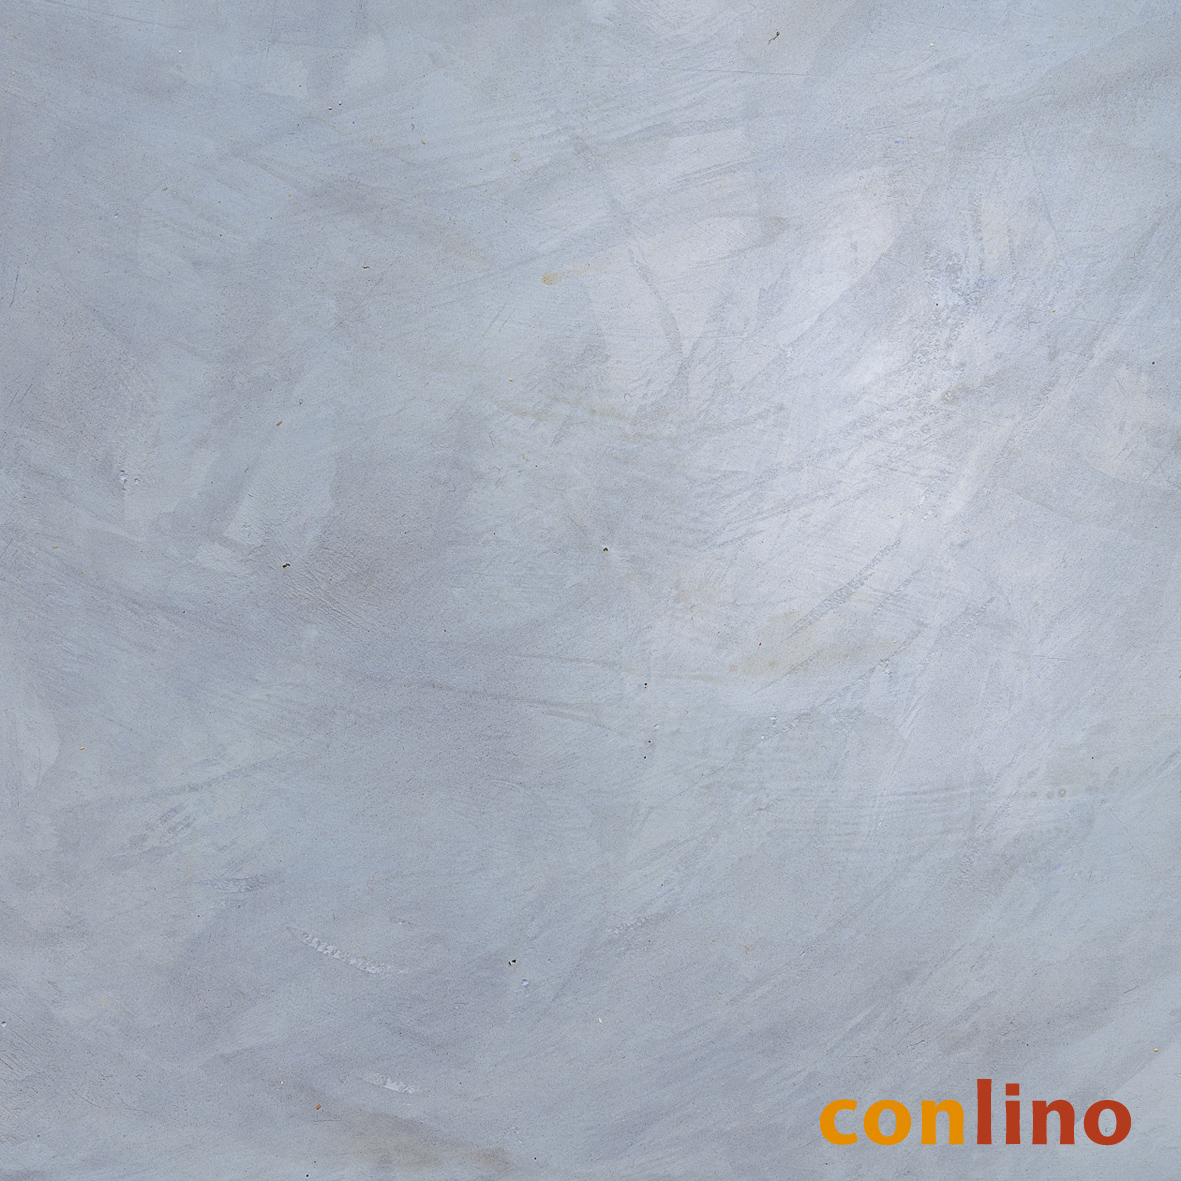 conlino Lehm-Glätte Lehmblau CG 131